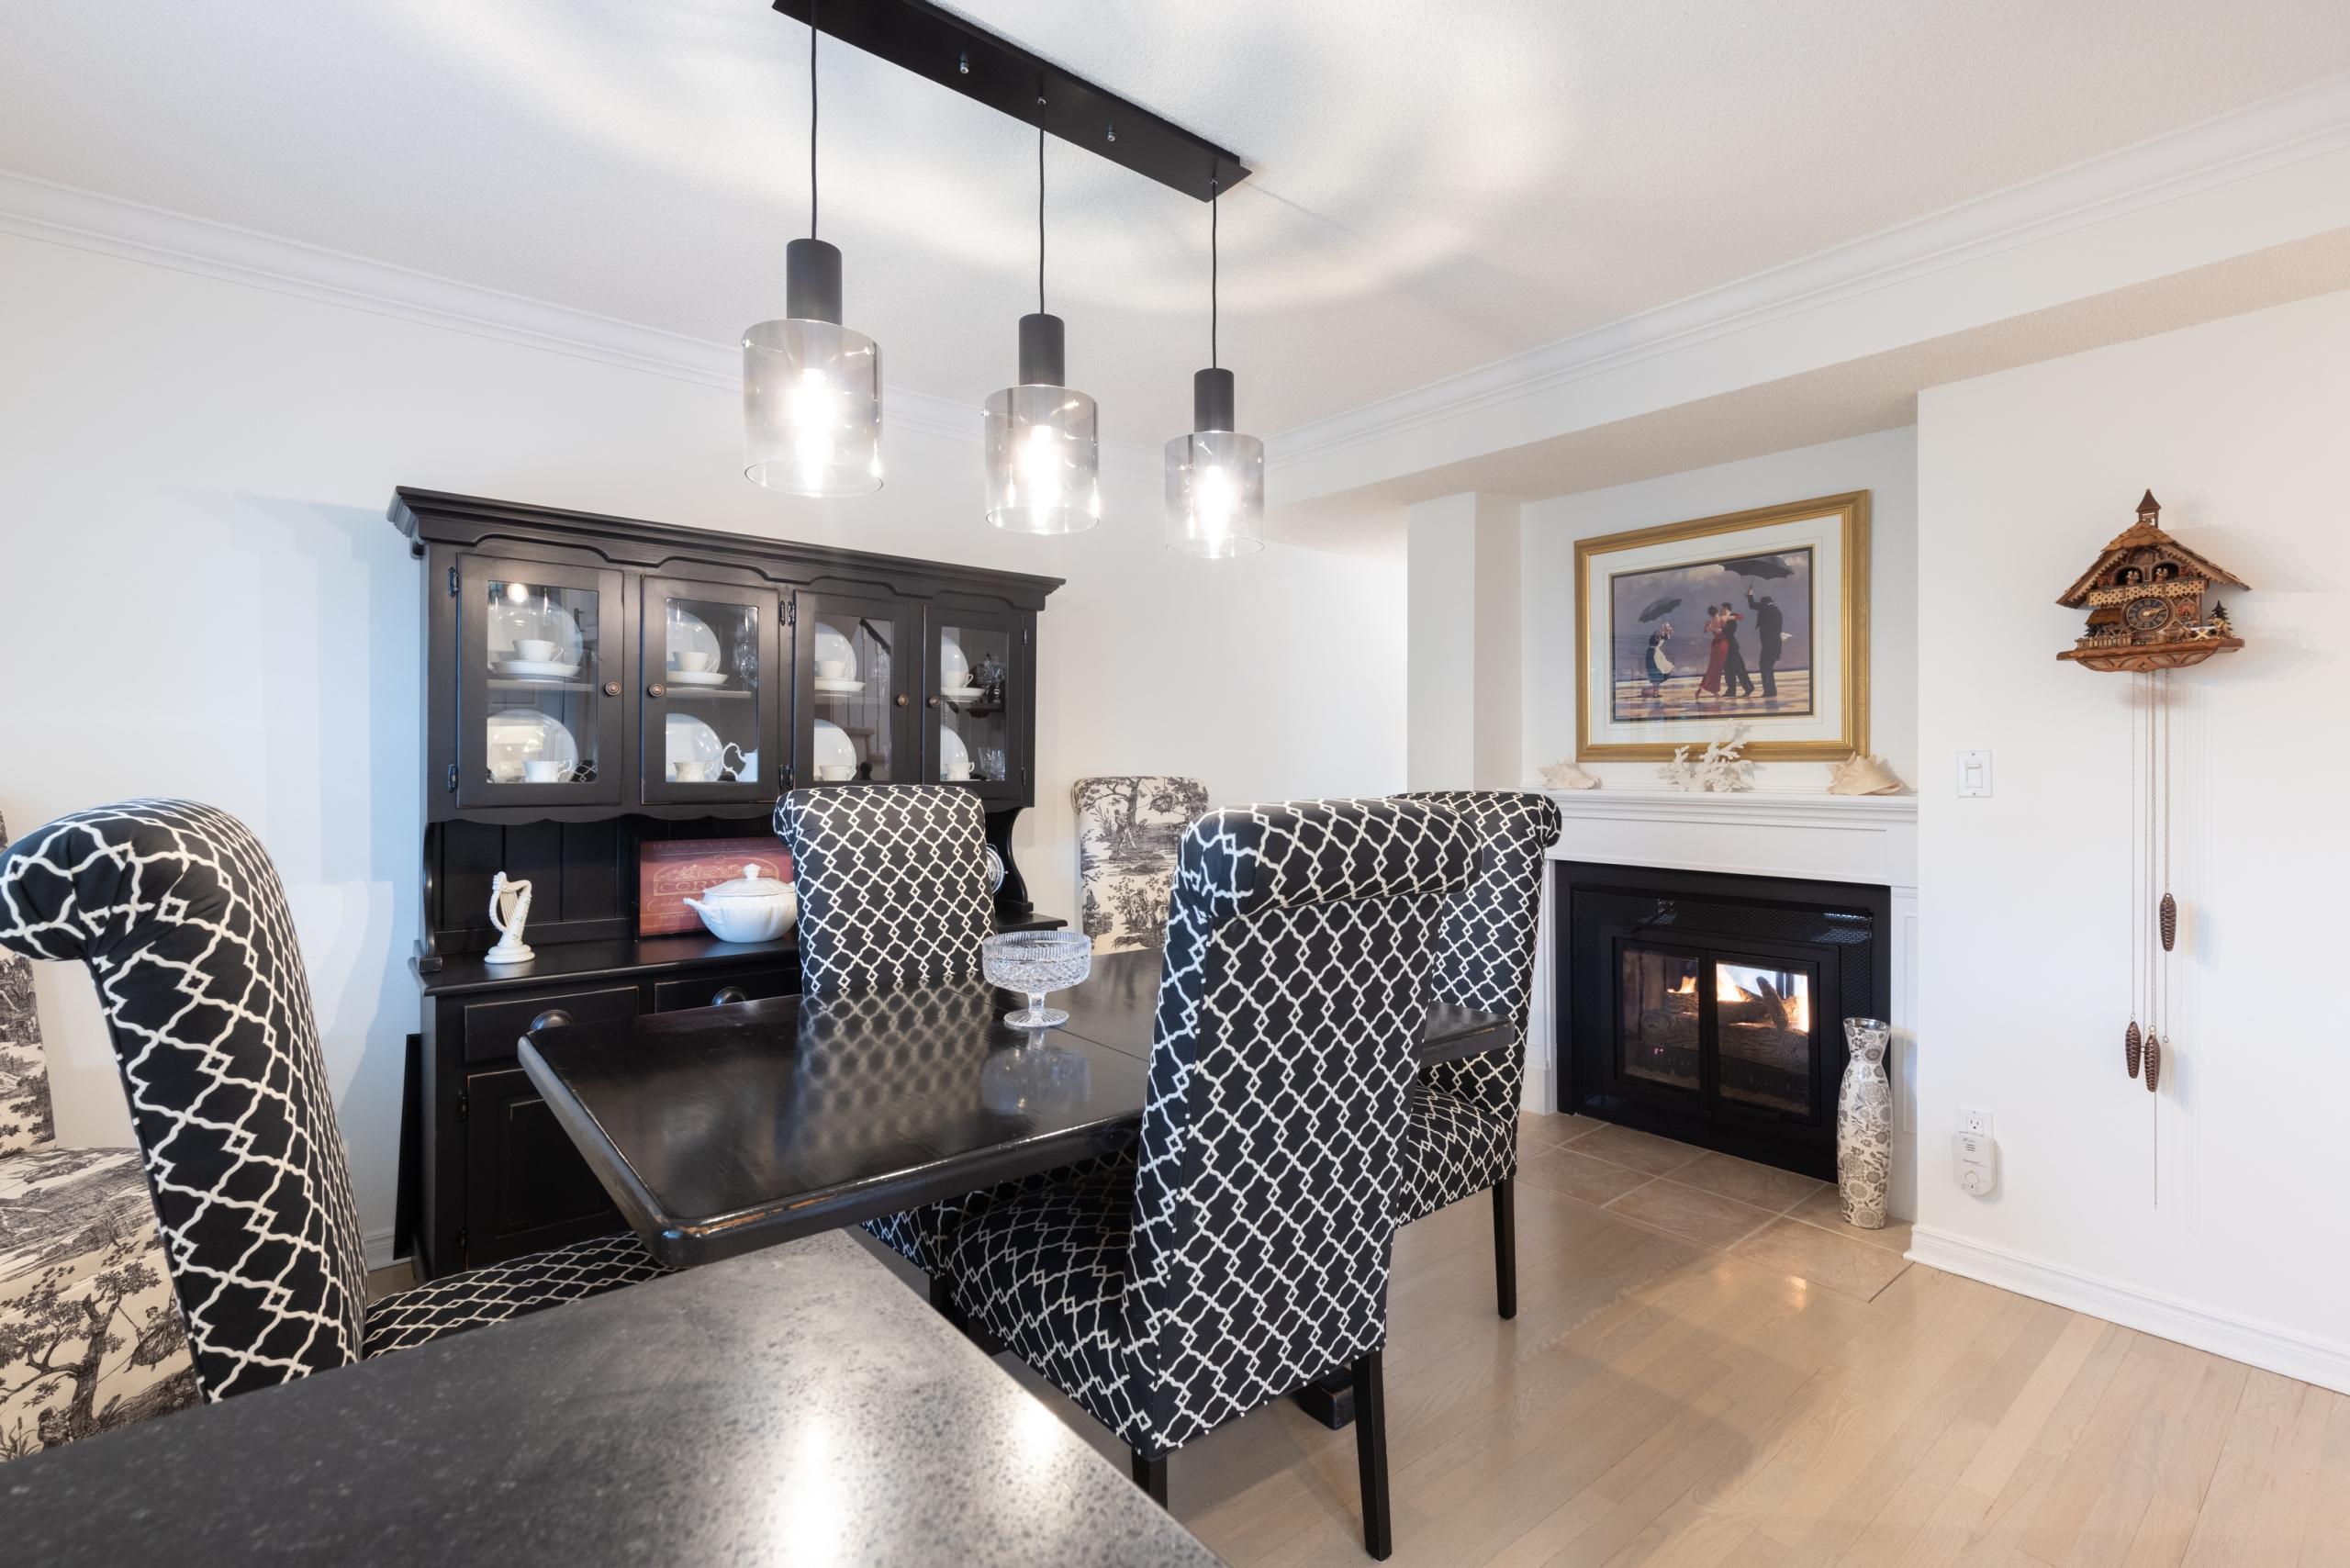 Dining room featured at 16-2299 Marine Drive, Oakville, ON at Alex Irish & Associates